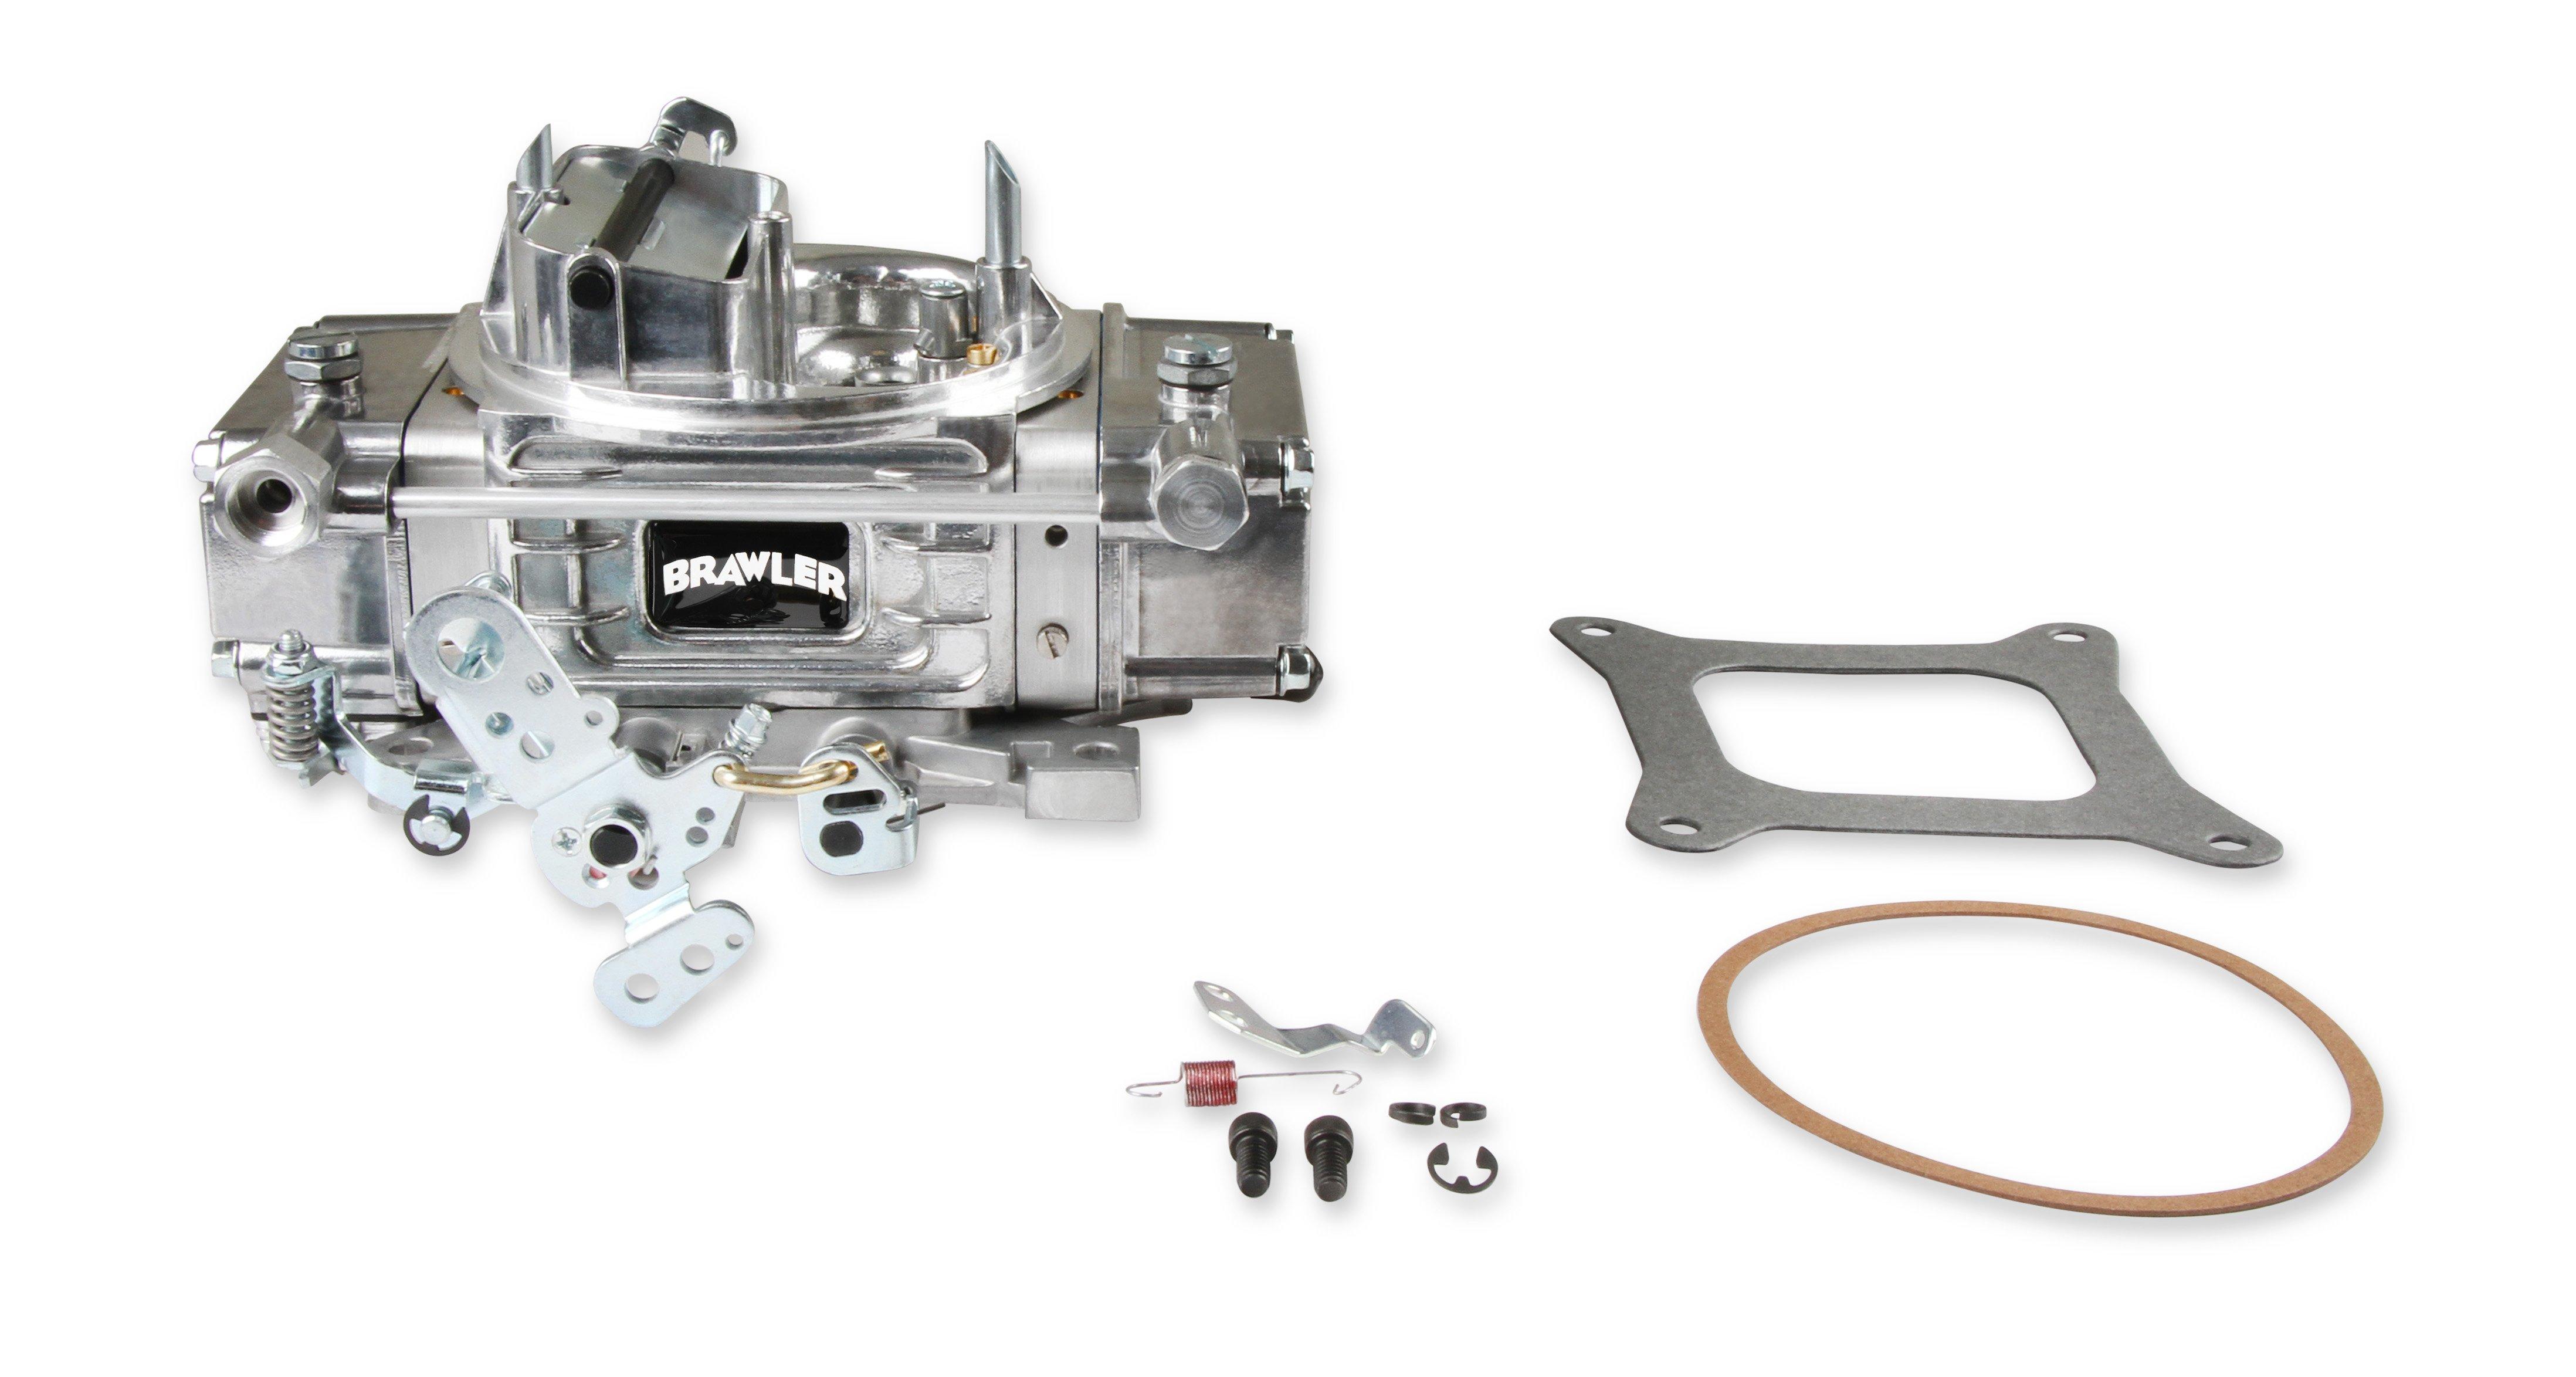 Brawler Br 650 Cfm Brawlercast Carburetor